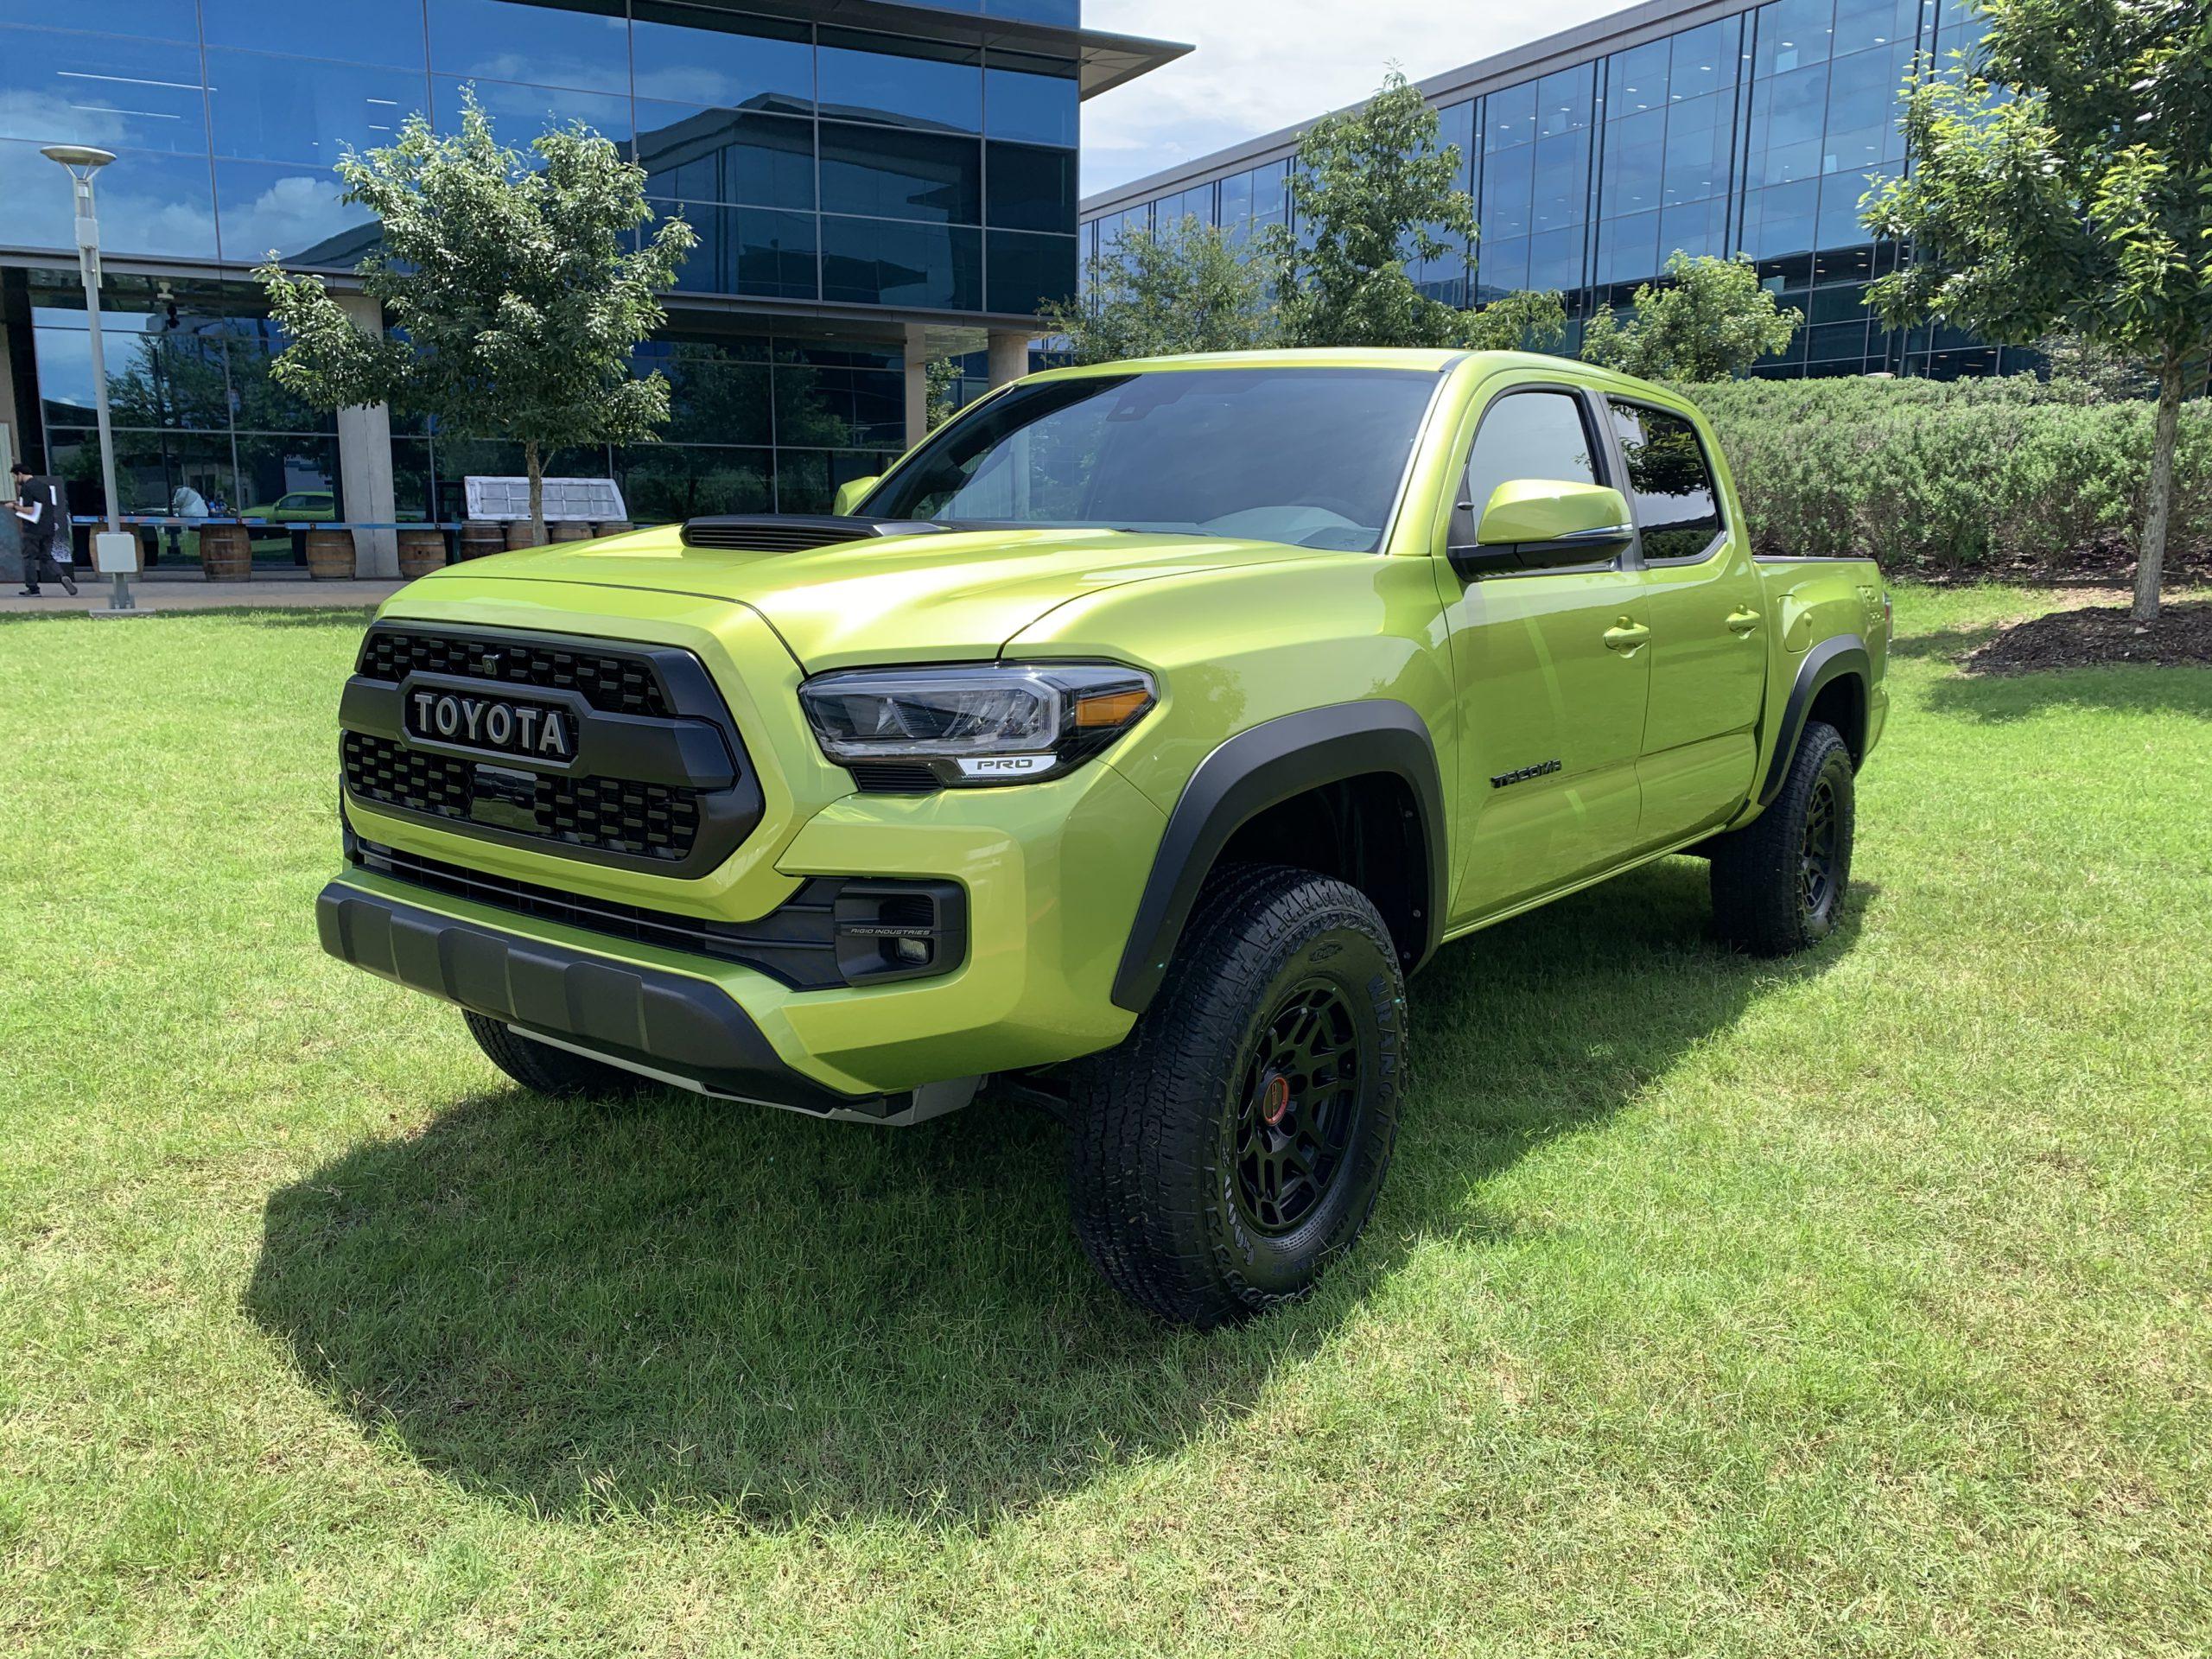 2022 Toyota Tacoma TRD Pro Electric Lime Metallic